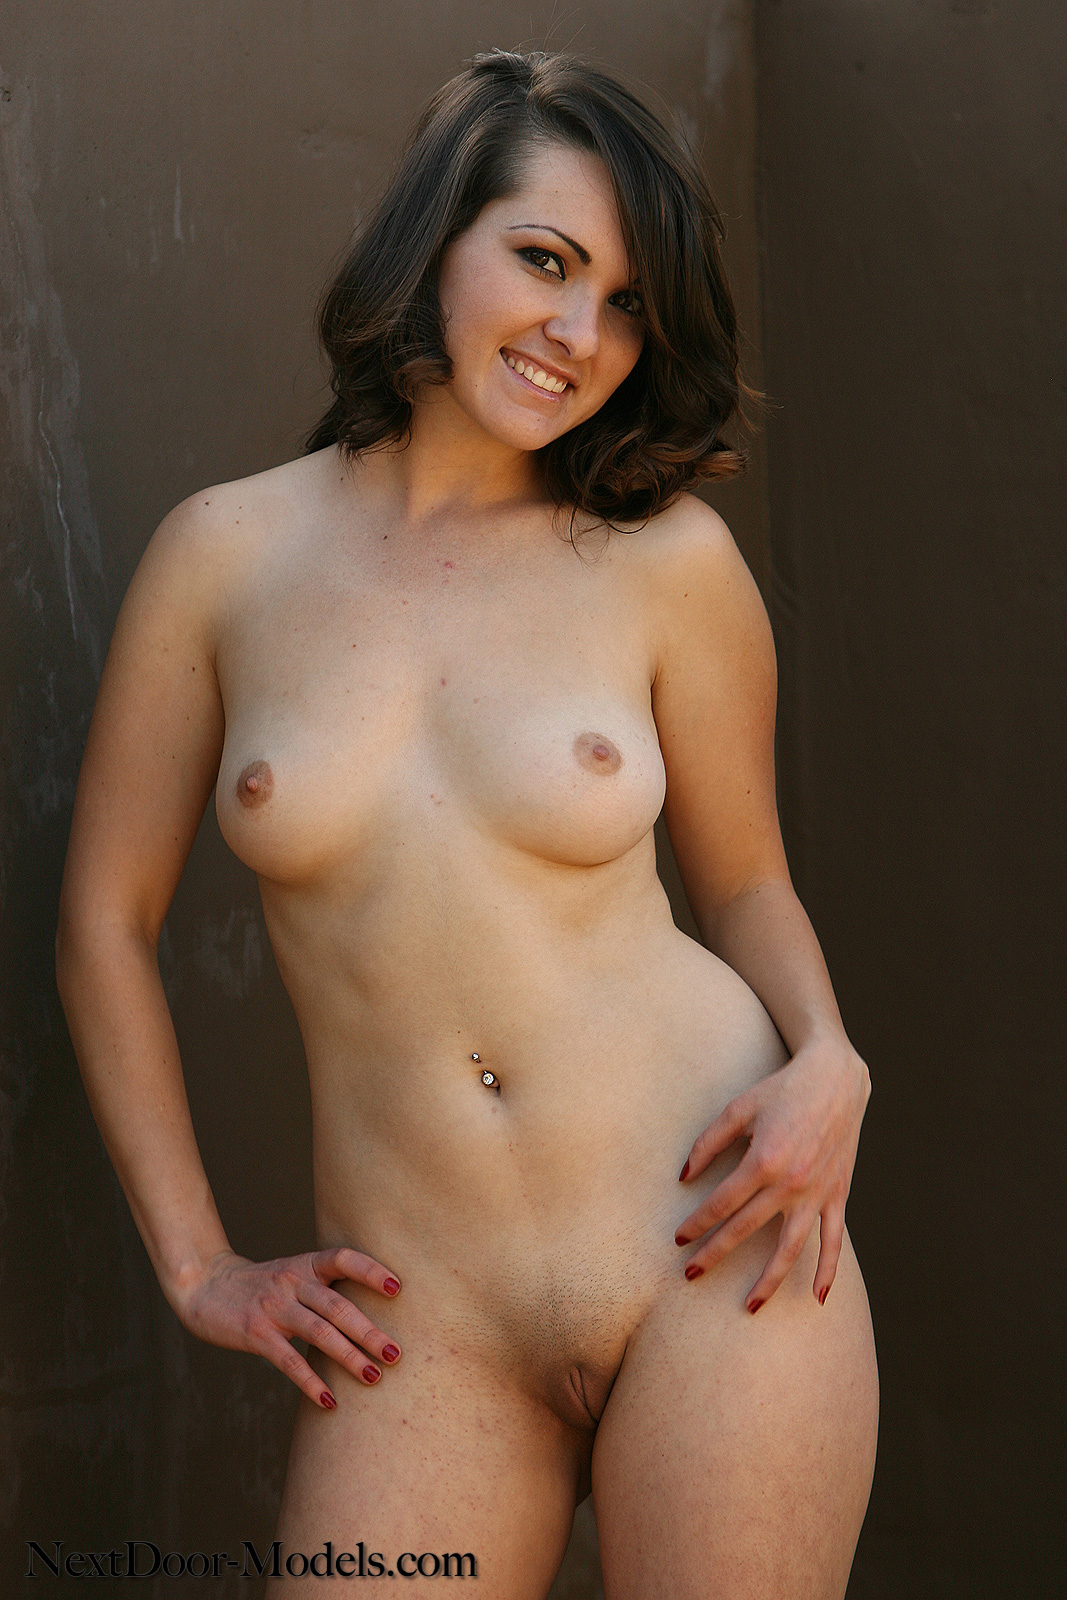 sexy midget babes naked